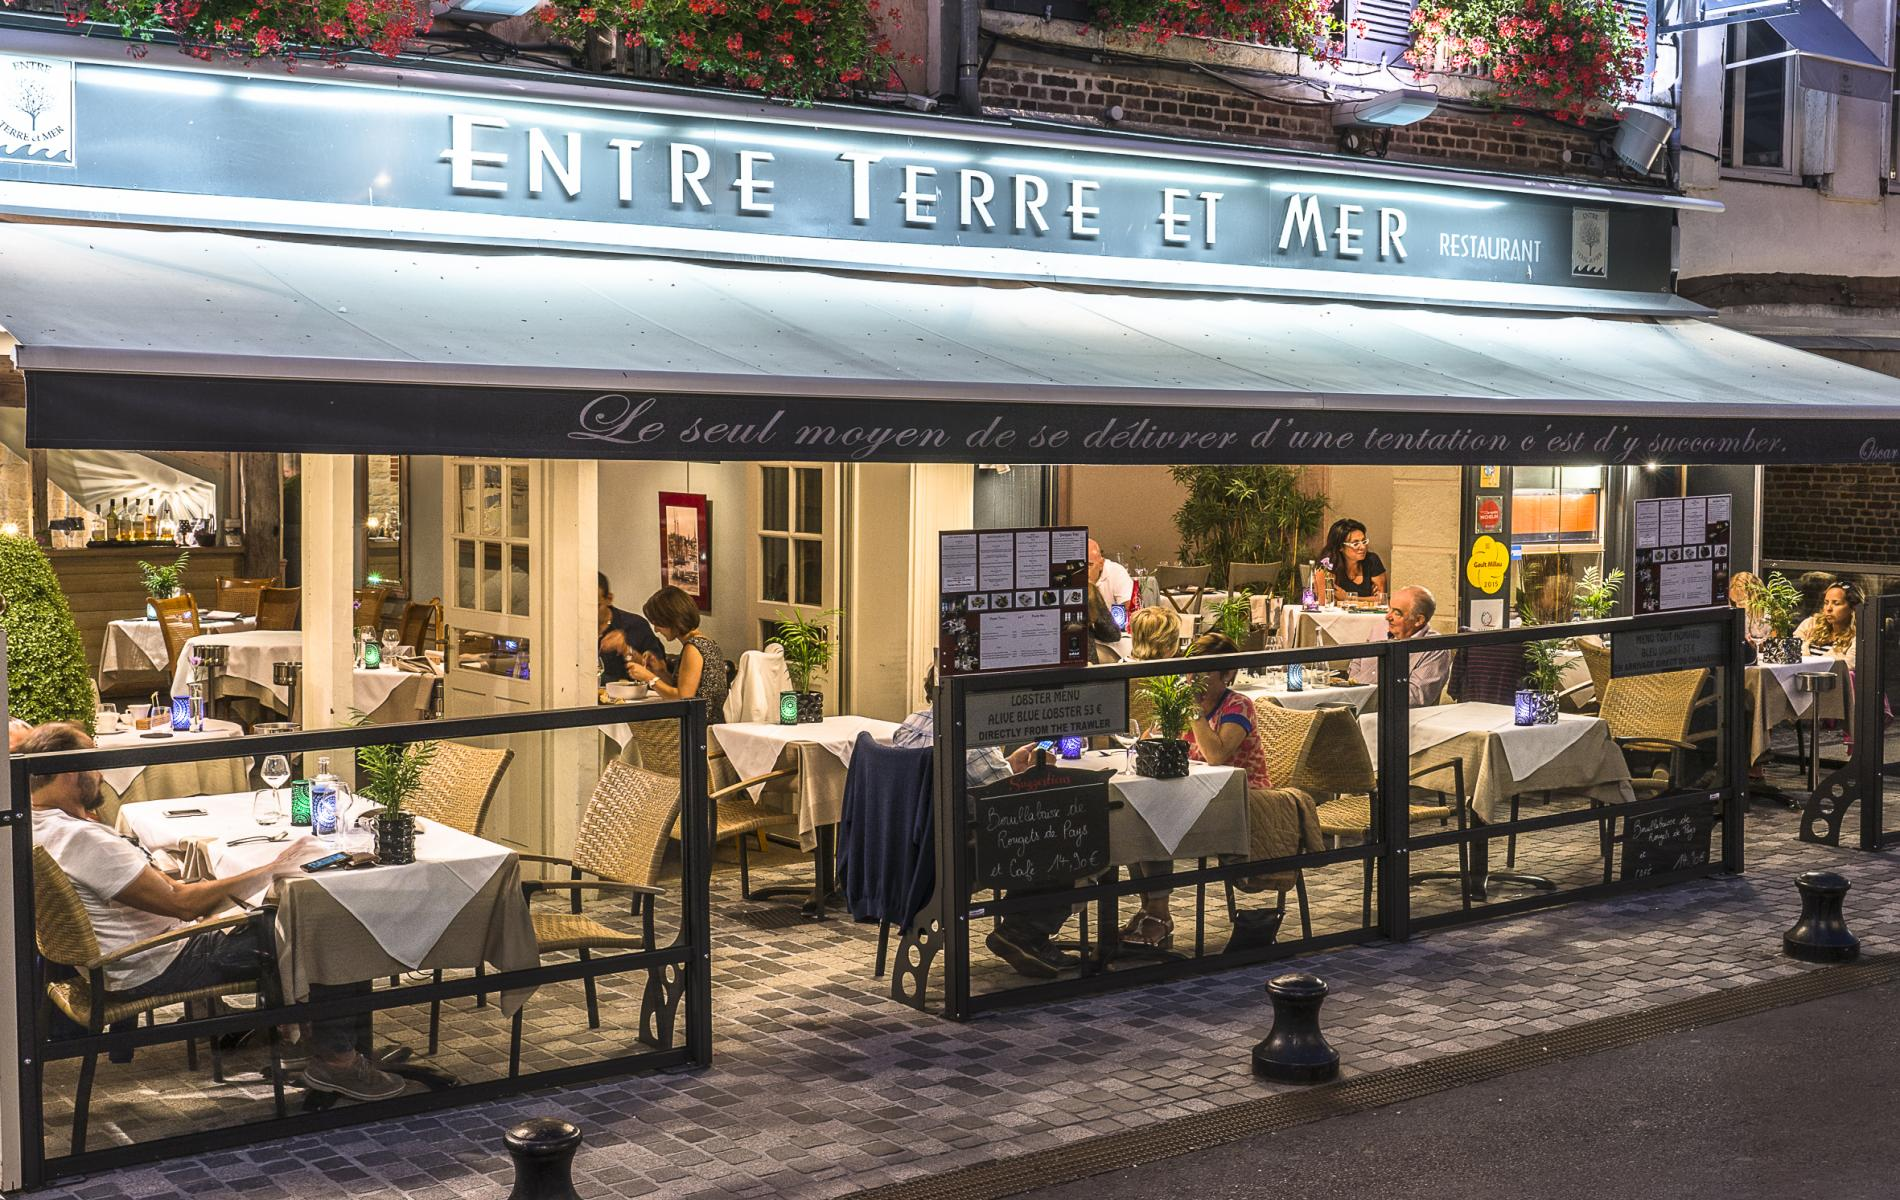 Restaurant Entre Terre et Mer - RESTAURANT en Normandie